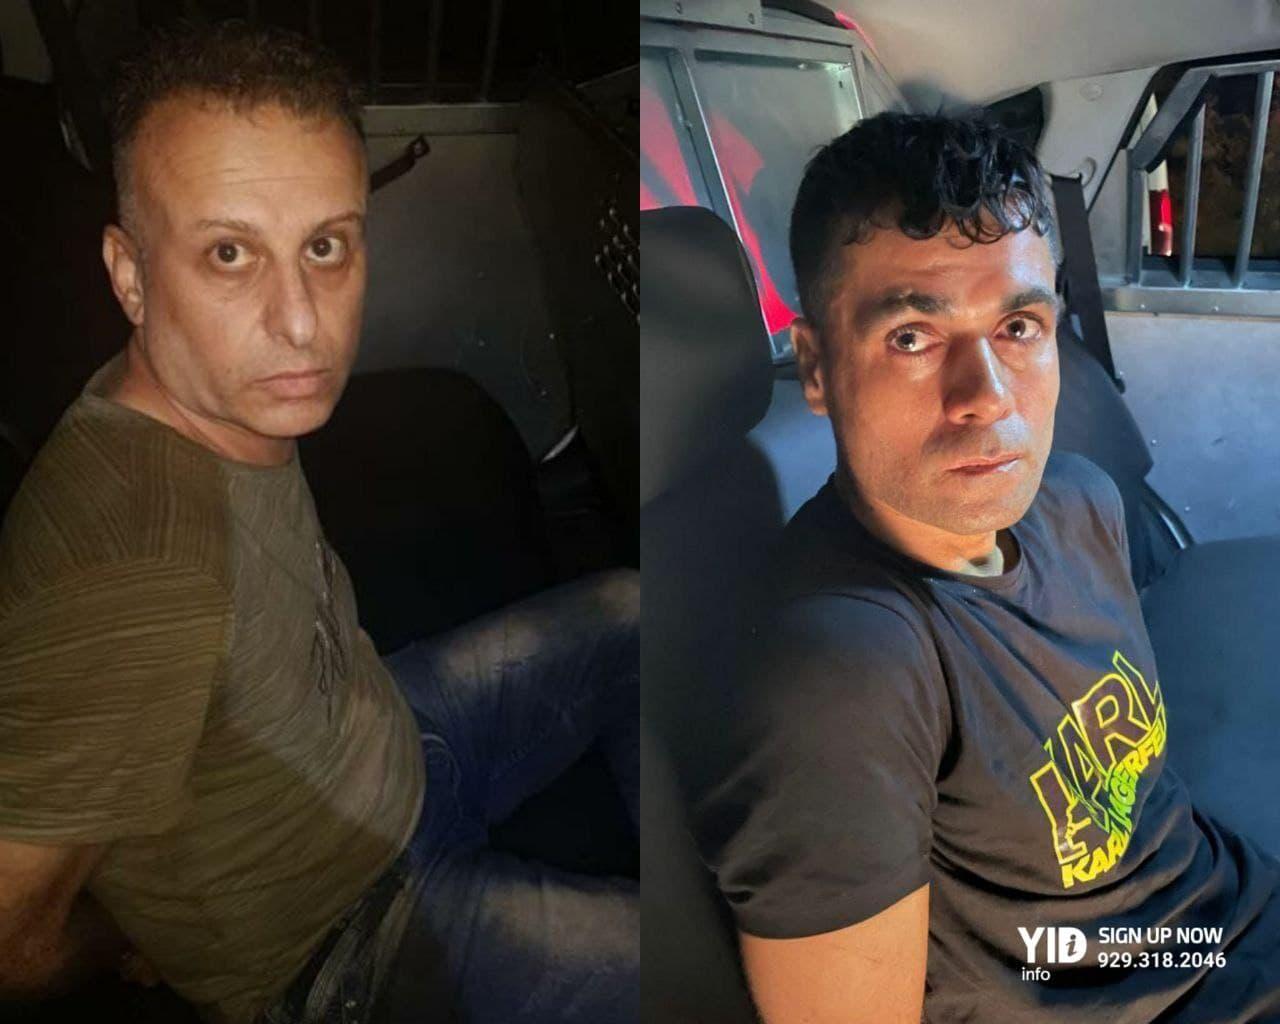 After 4 days of hiding, cops arrest 2 of 6 fugitives from Gilboa prison